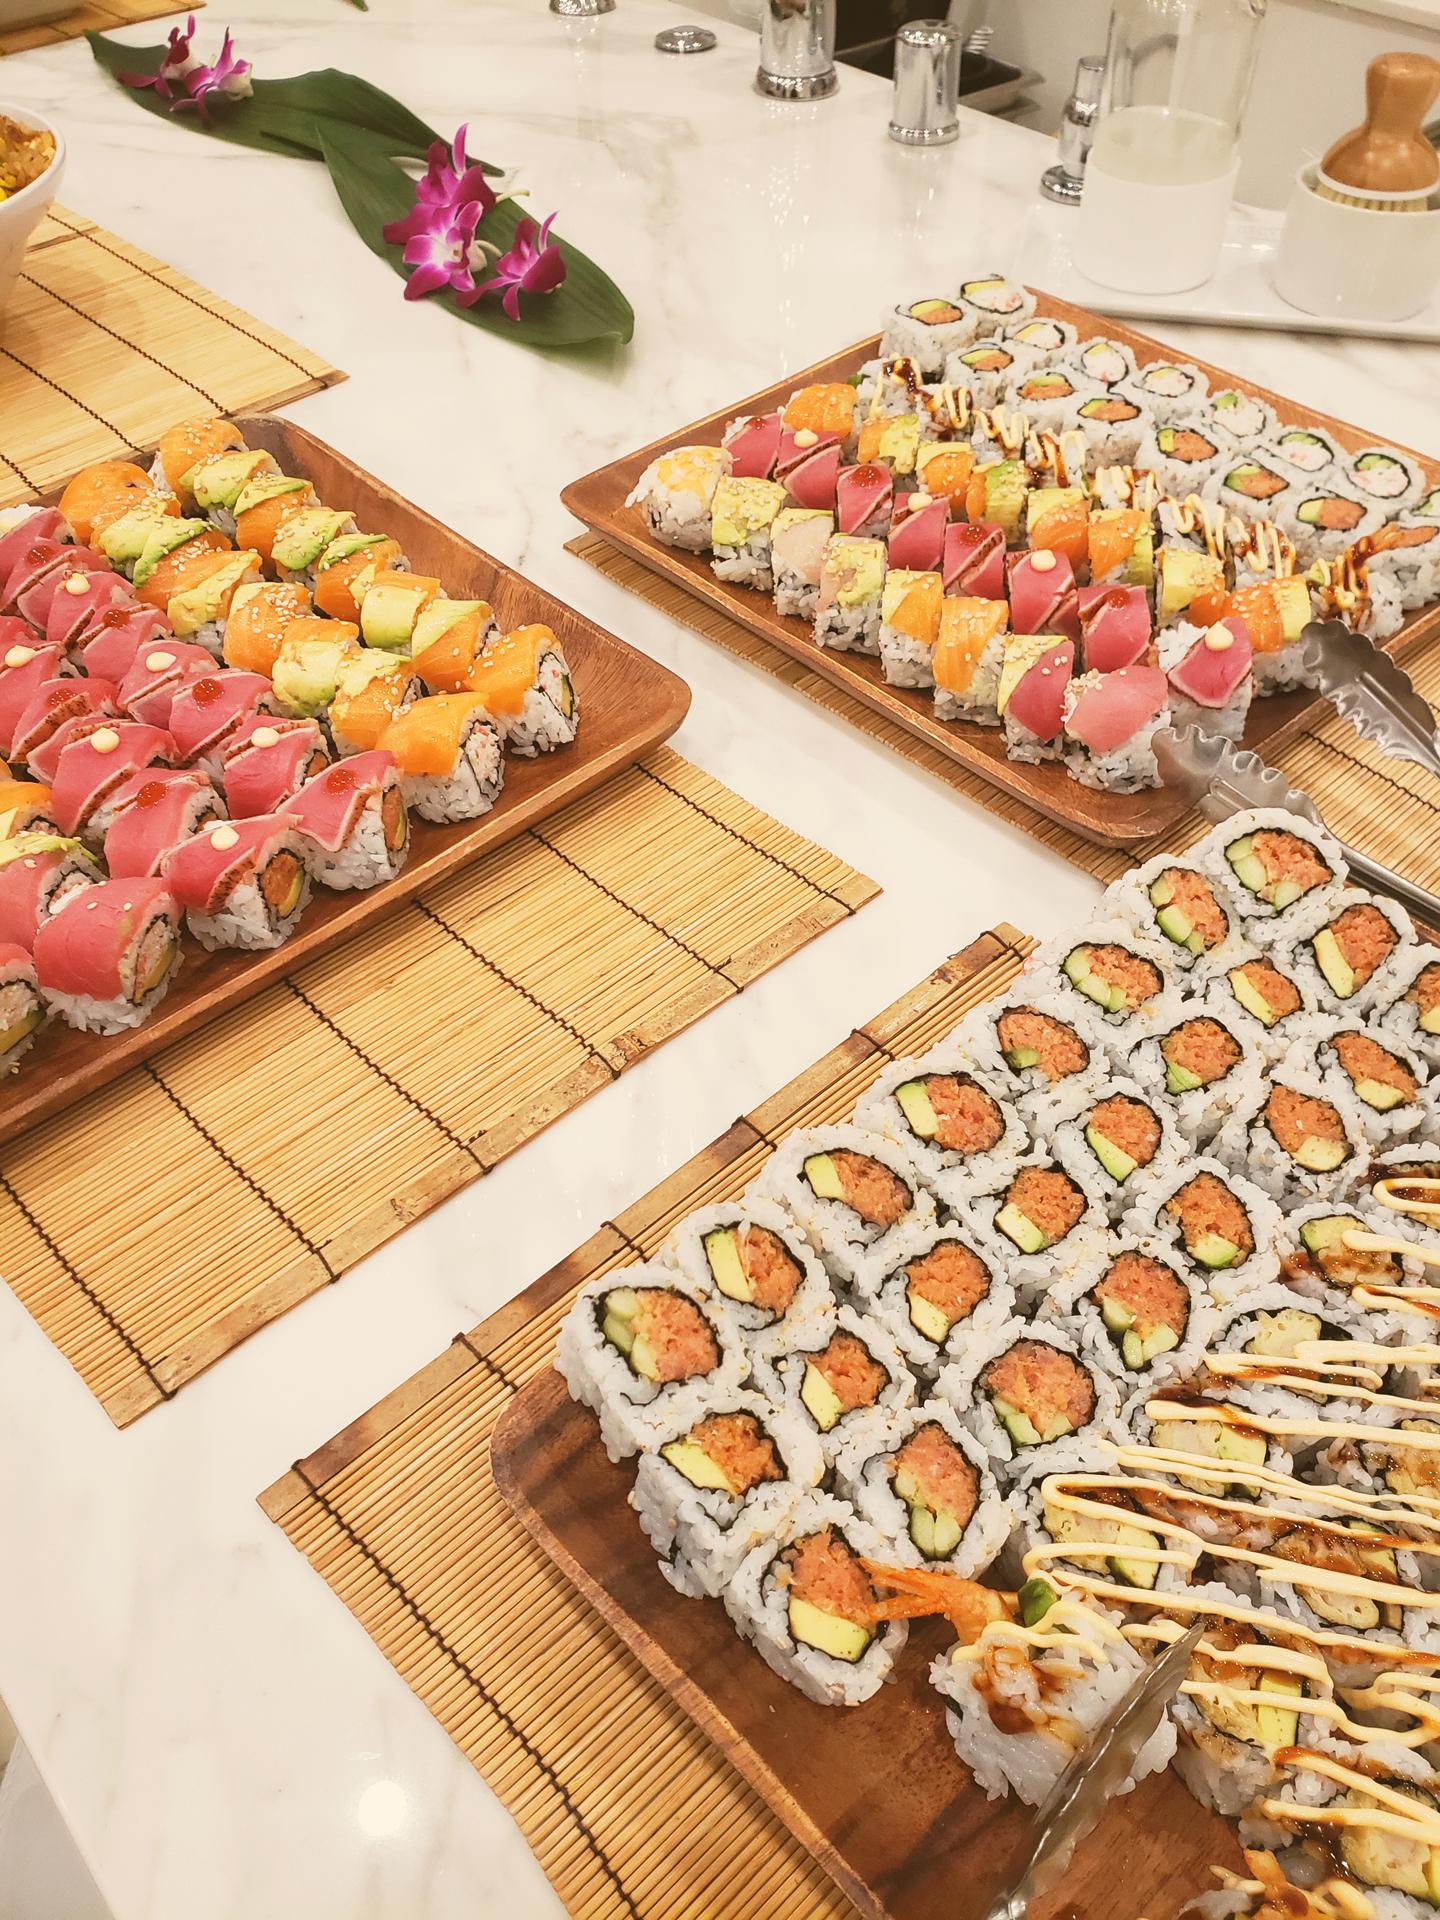 akioni-catering-sushi-teppanyaki-luau-japanese-cuisine-hawaiian-bbq-hibachi.jpg